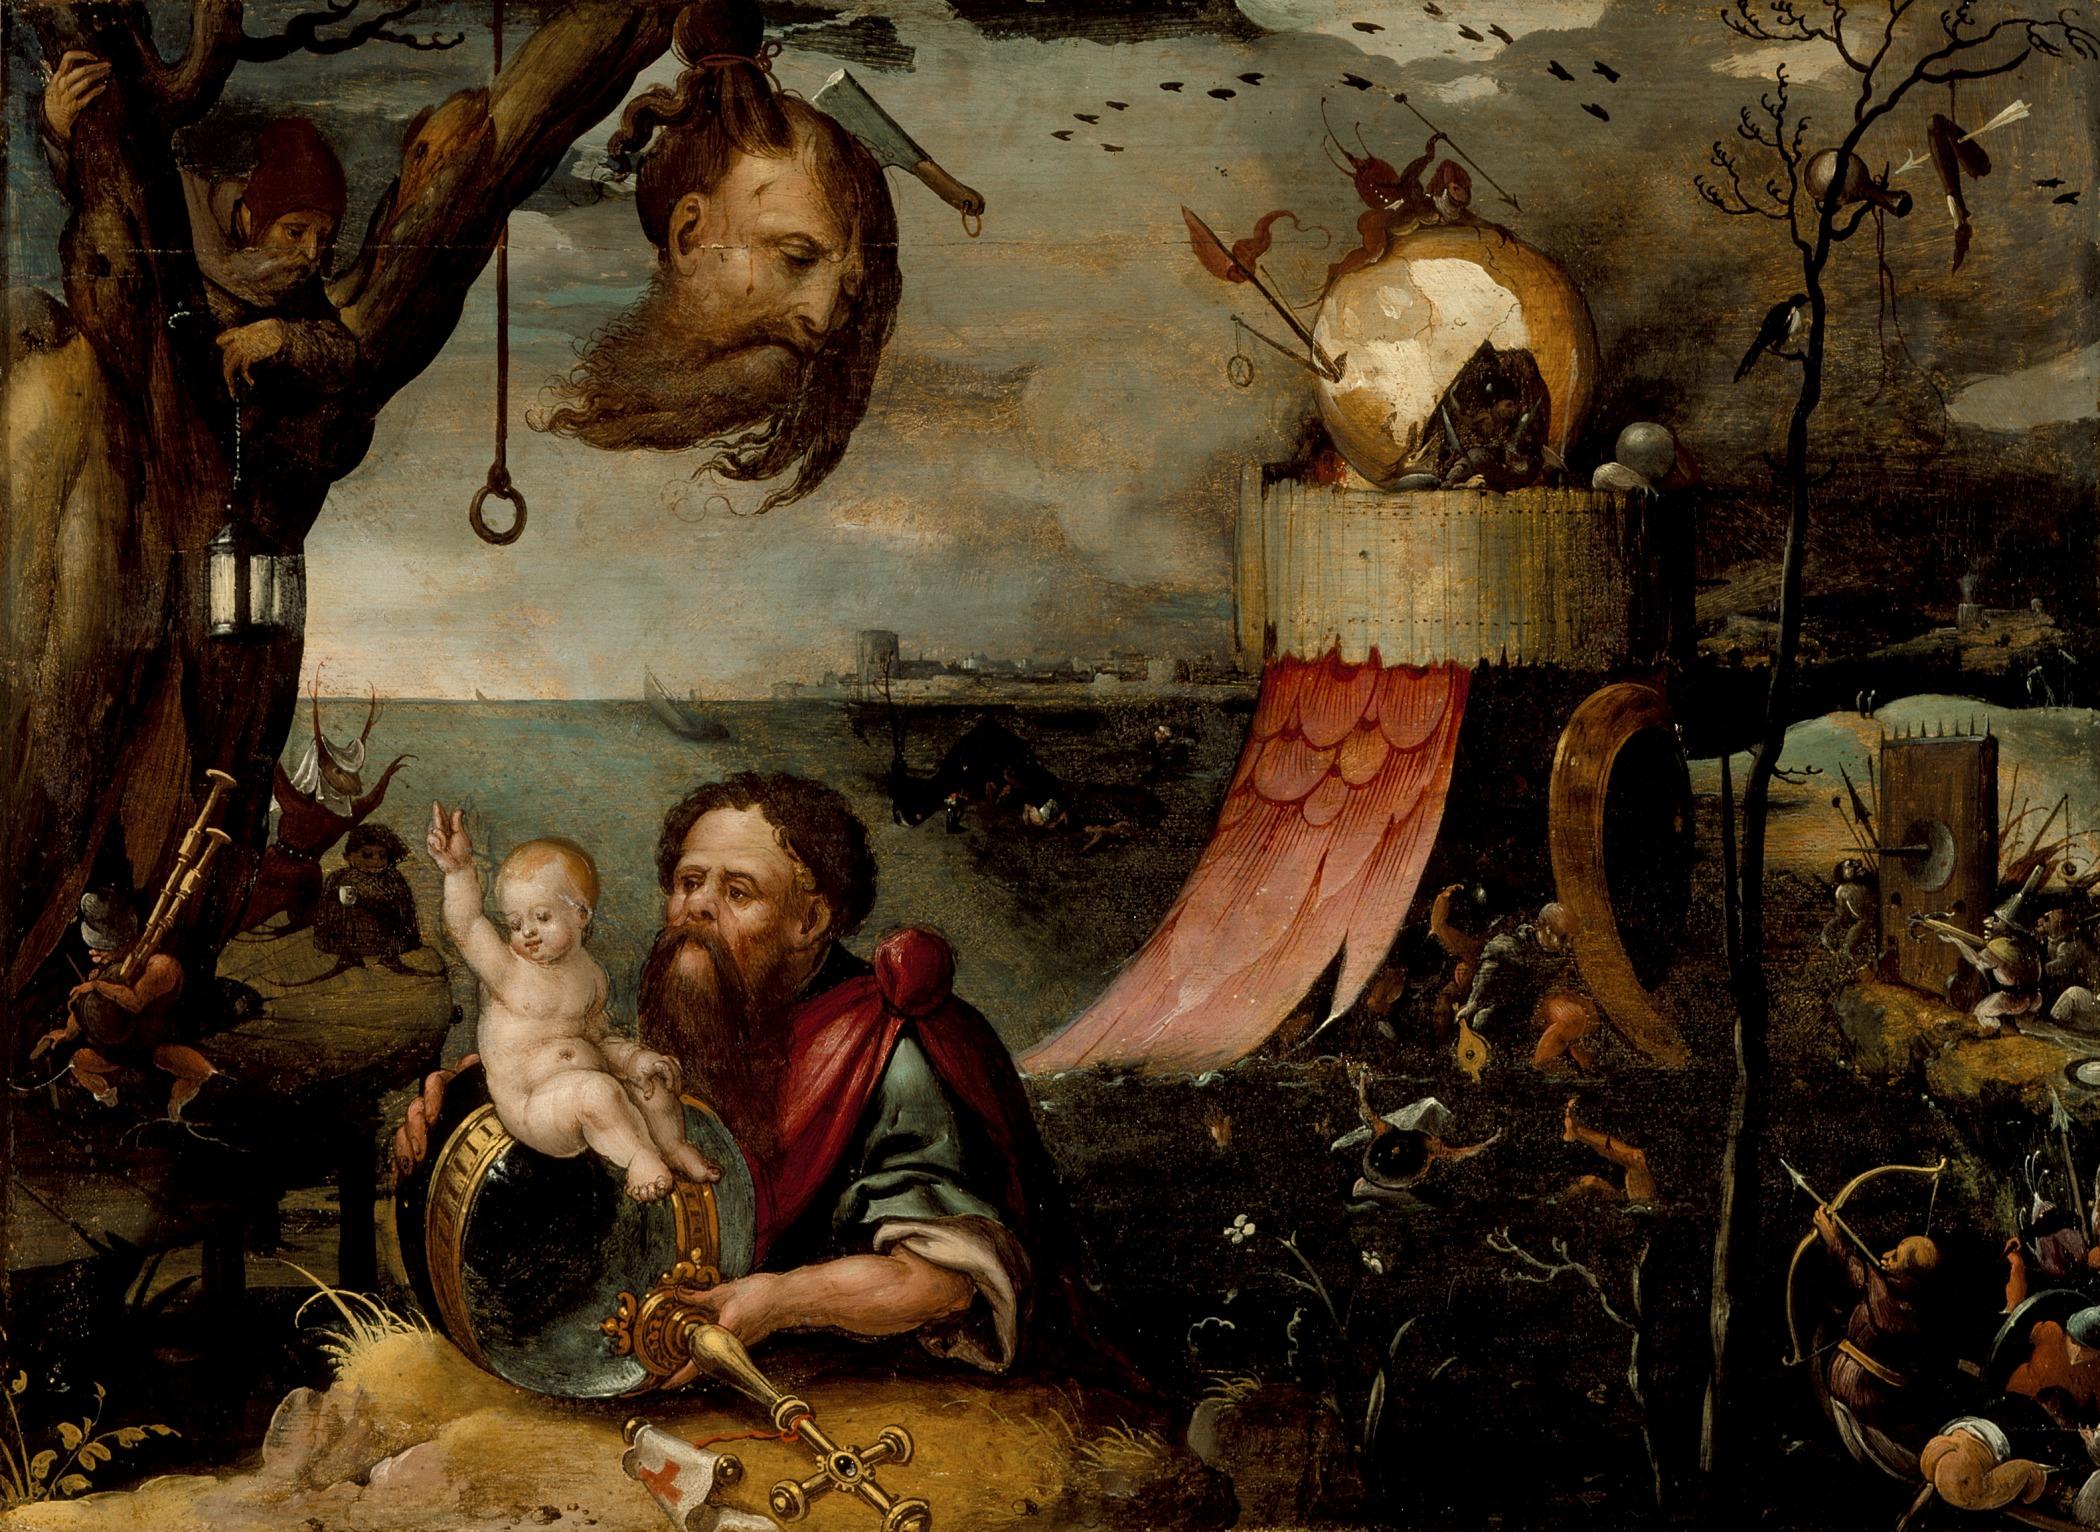 originaljan-mandyn-flanders-saint-christopher-and-the-christ-child-ca-1550.jpg